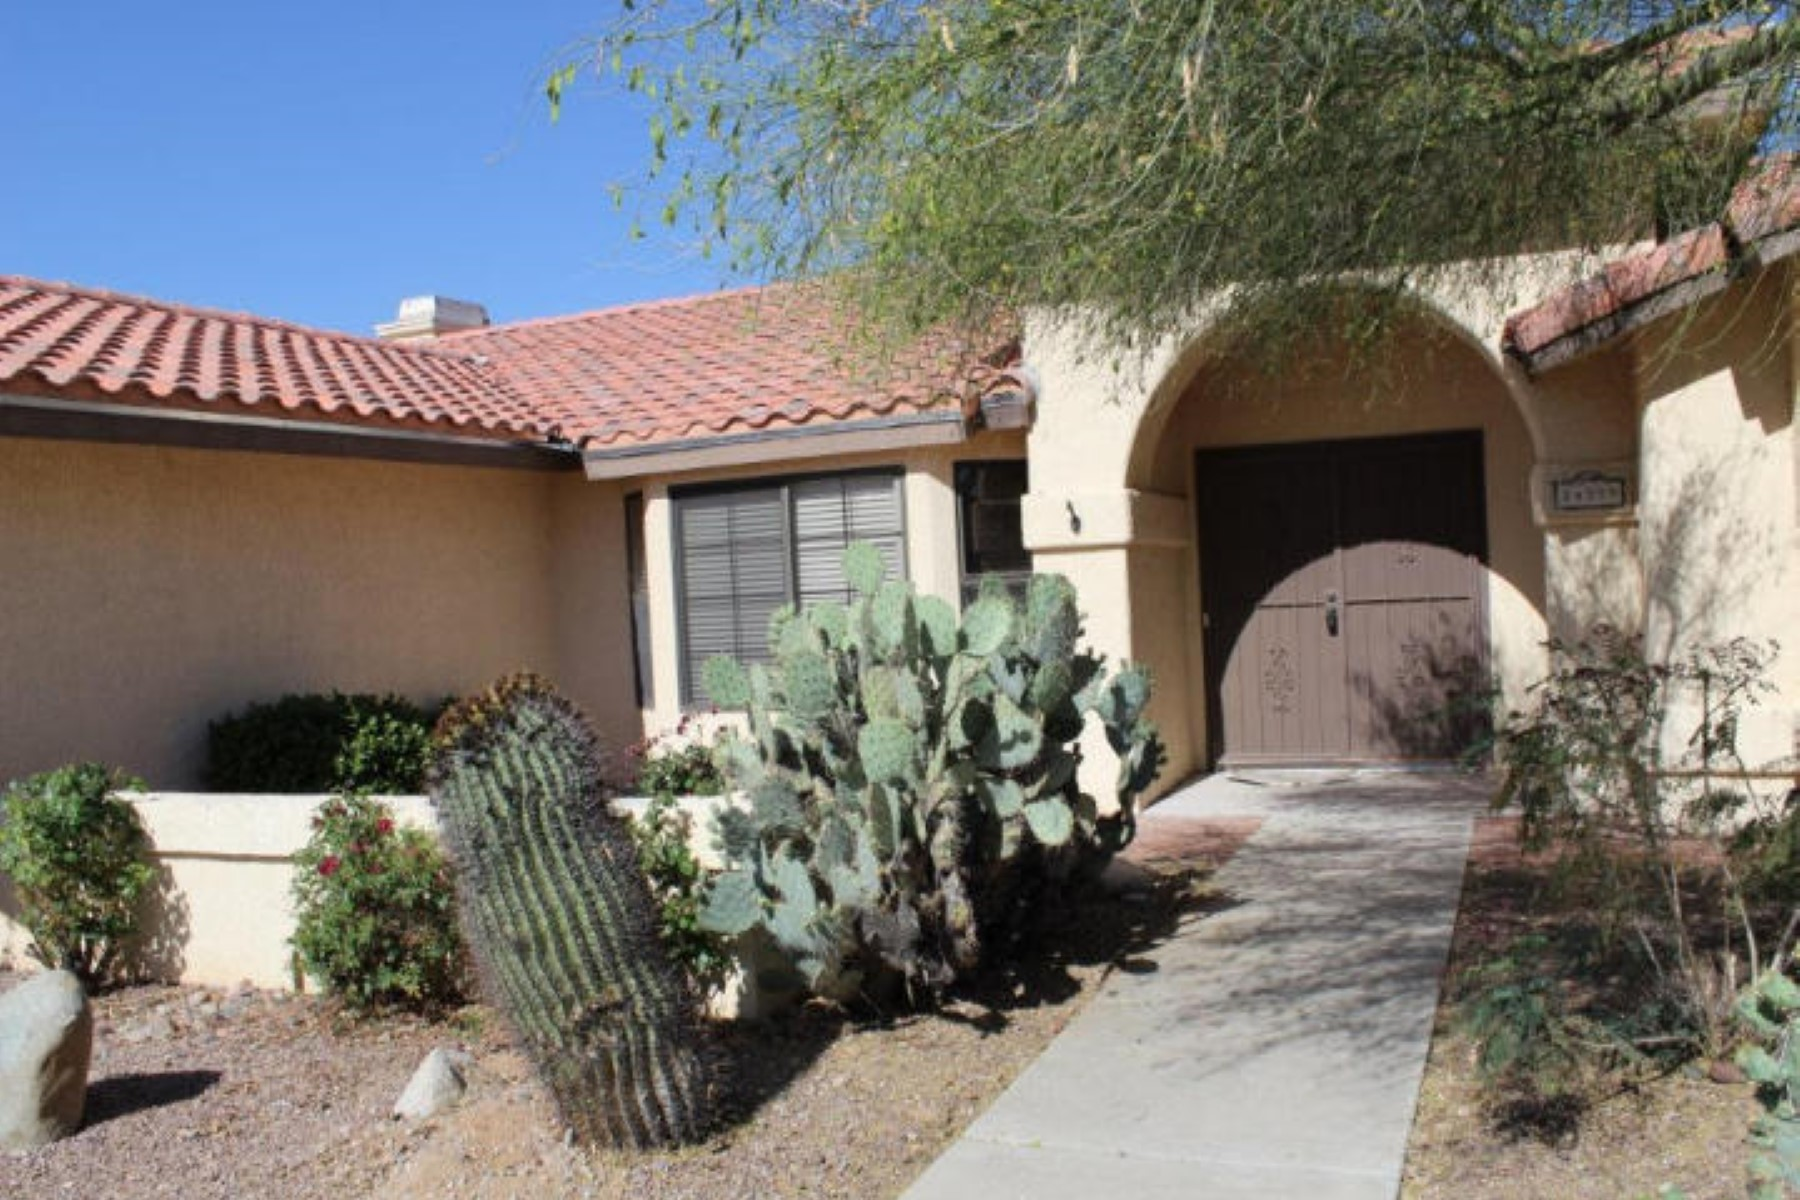 Частный односемейный дом для того Продажа на Crown Point Model with three bed and two Bath. 14339 N Silkwind Way Oro Valley, Аризона 85755 Соединенные Штаты